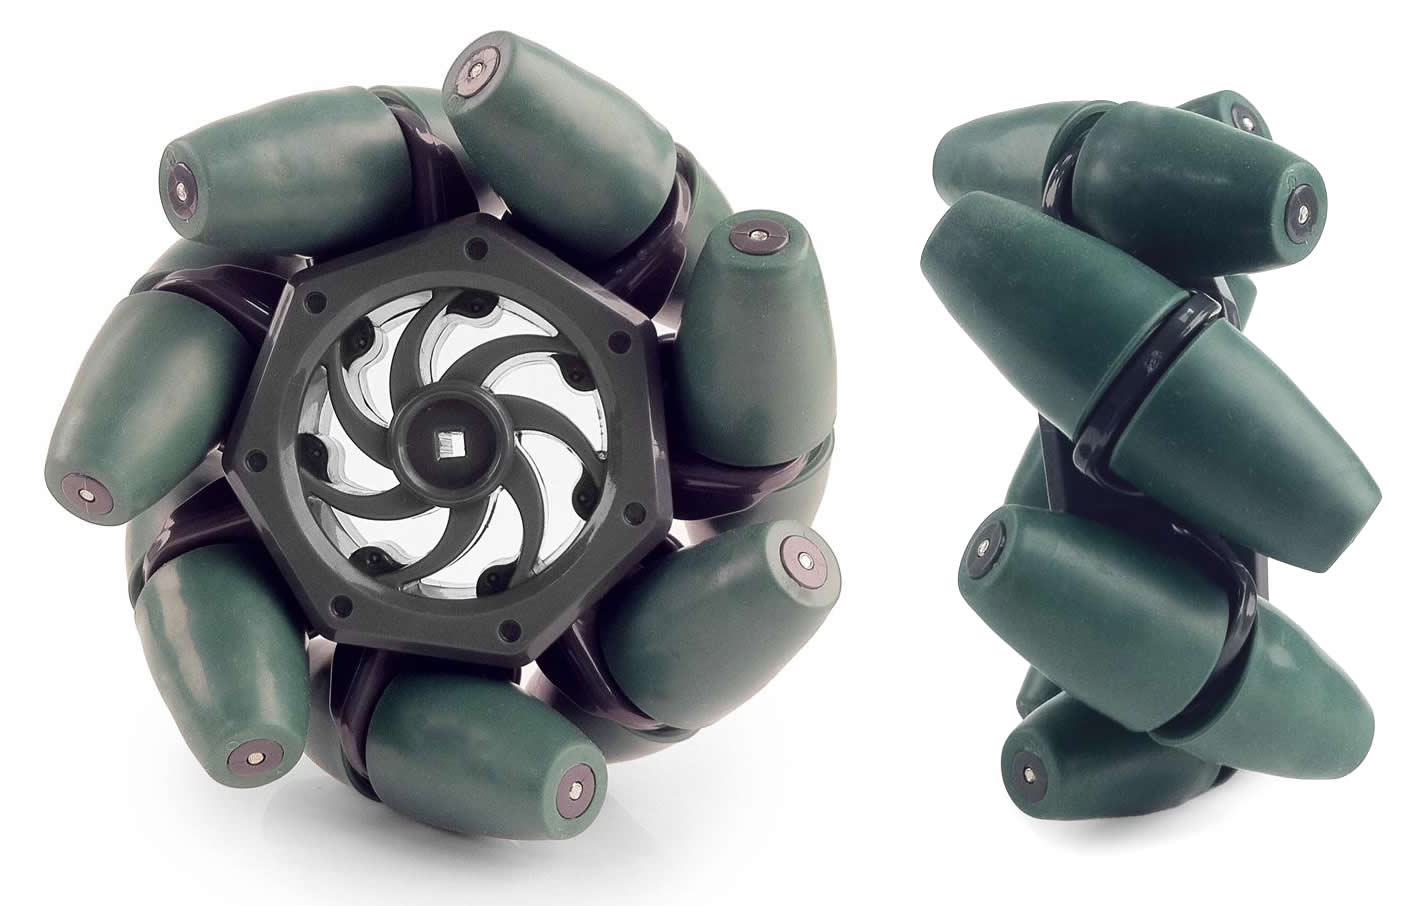 hight resolution of vex brand mecanum wheels